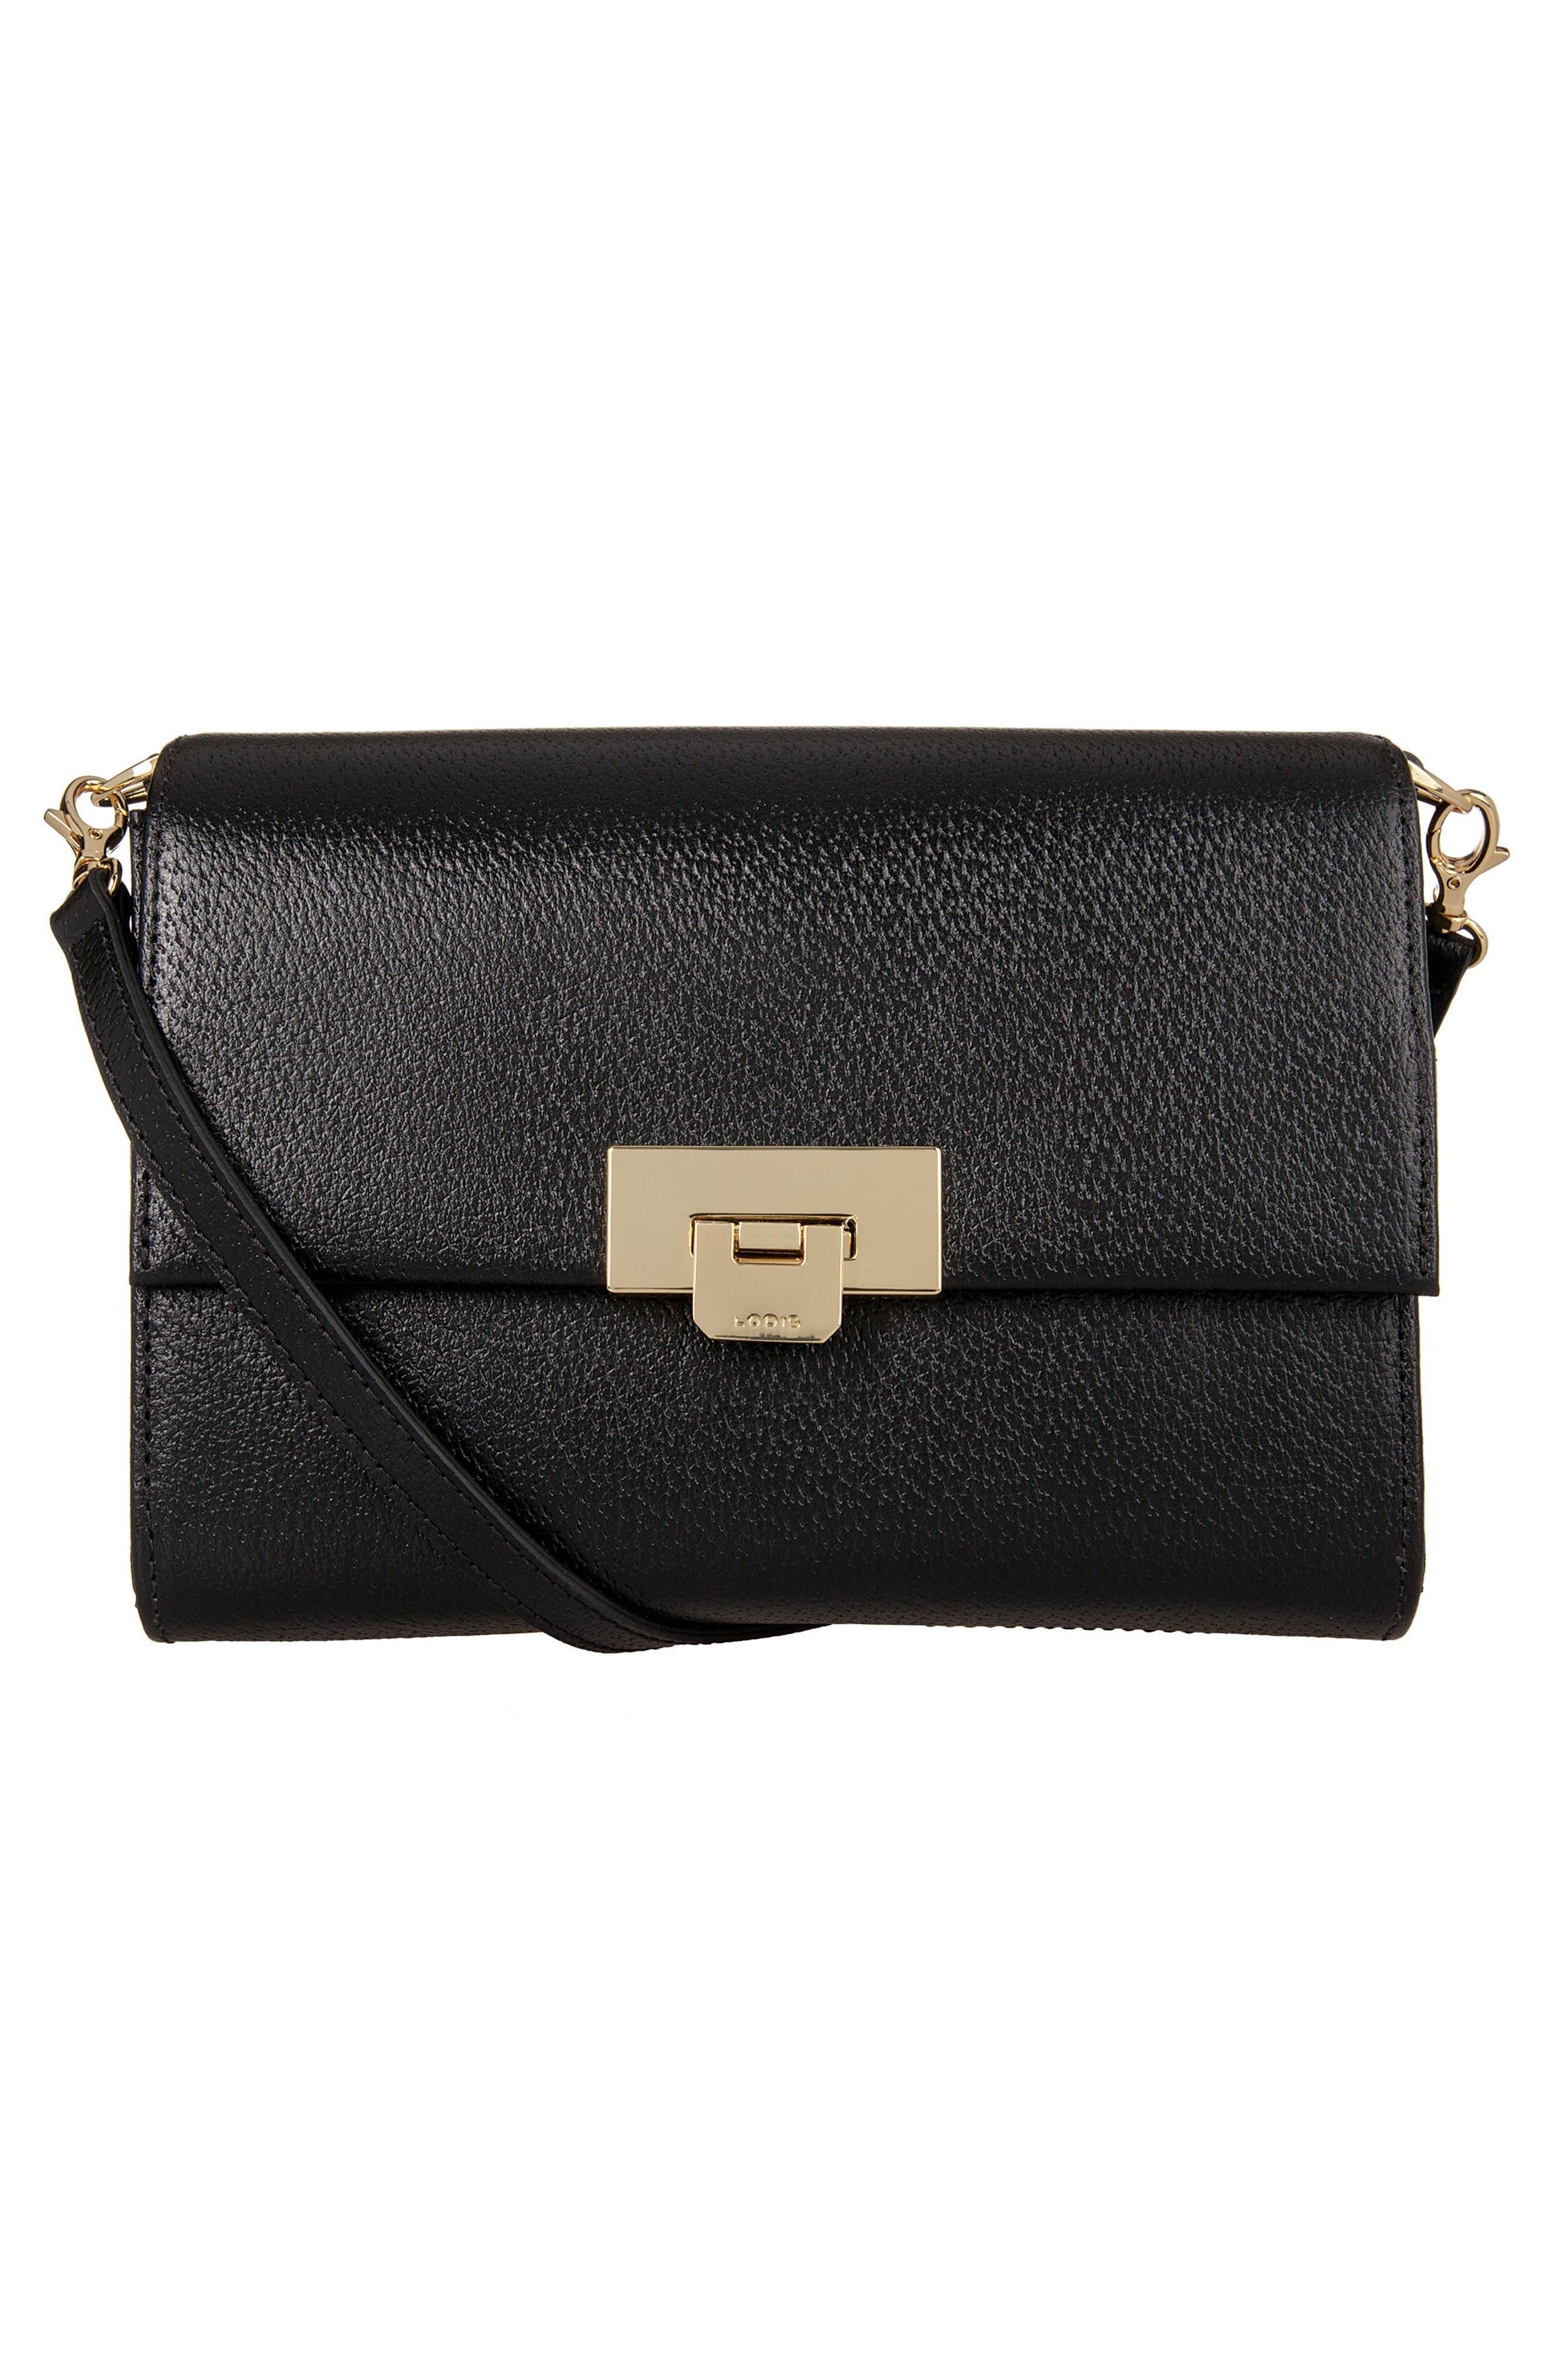 Main Image - Lodis Stephanie Under Lock & Key - Small Eden Leather Crossbody Bag